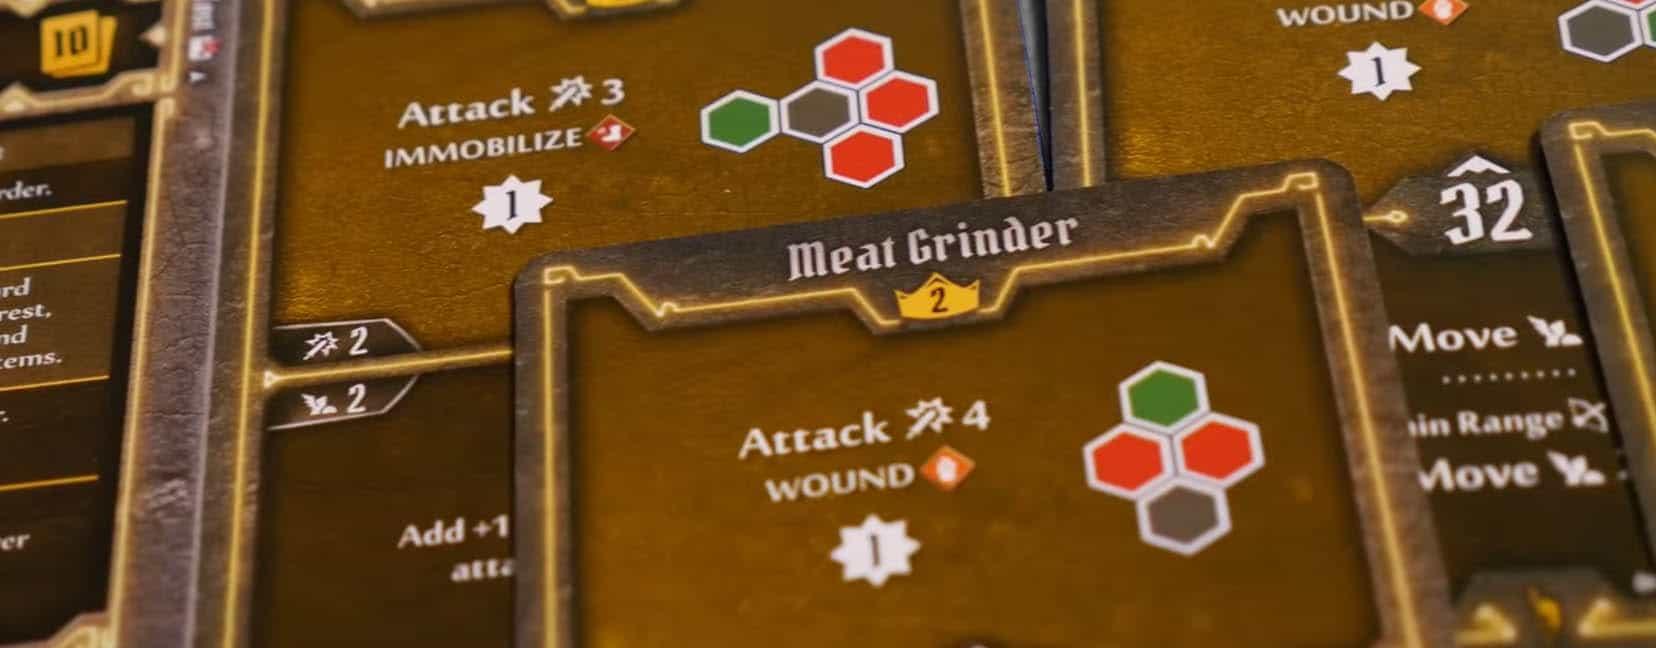 Frosthaven Aktionskarten